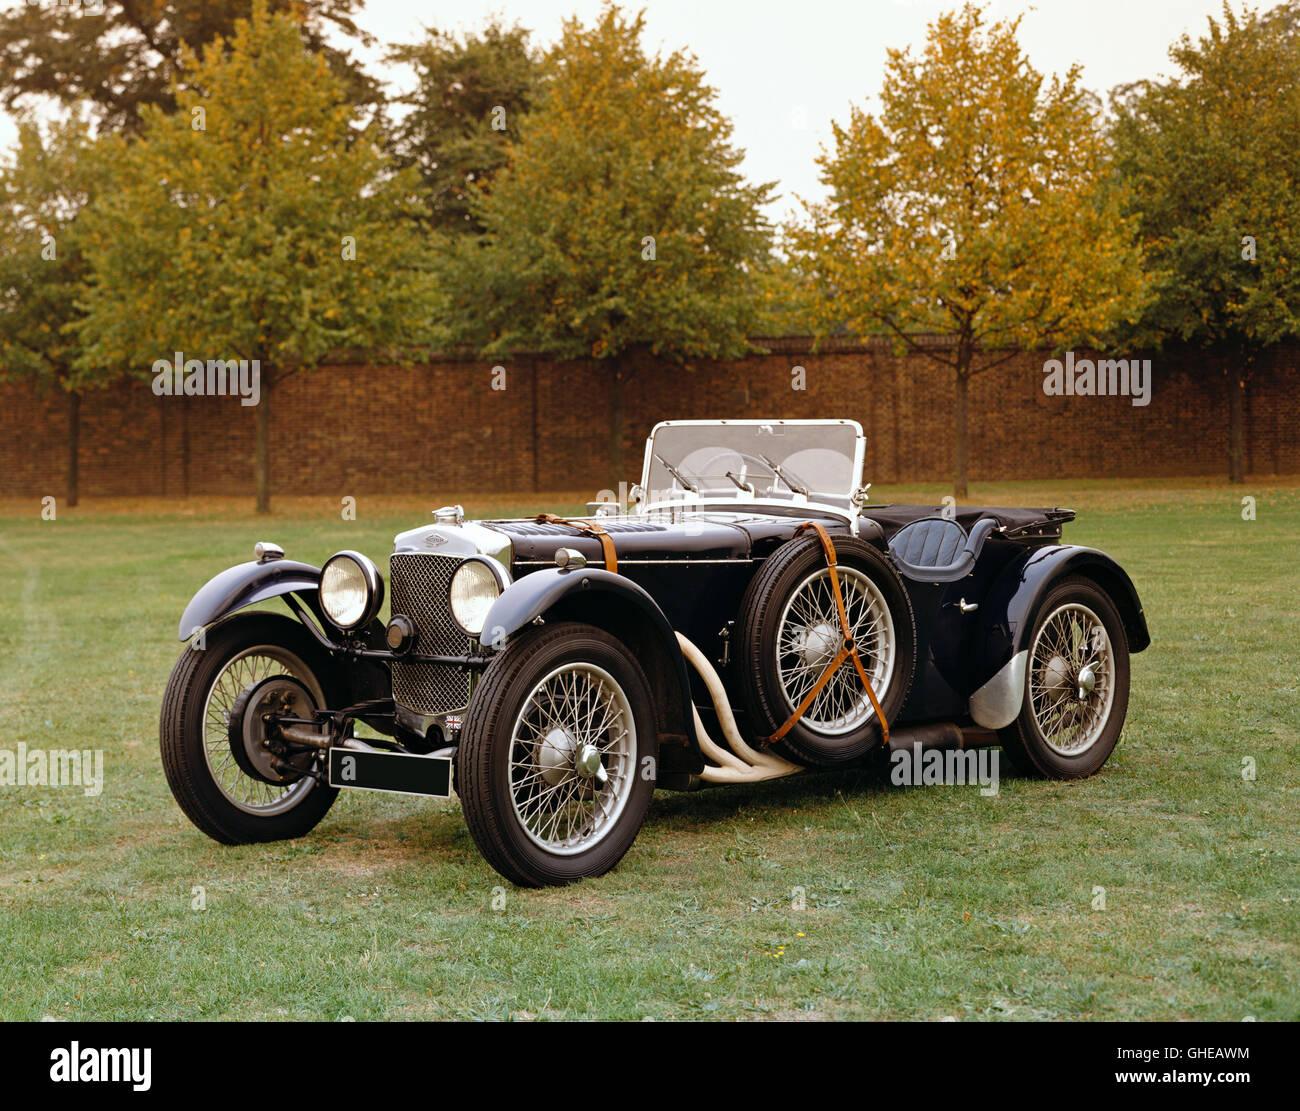 1932 Frazer Nash TT Replica 1 5 litre sports 2 seater Country of origin United Kingdom - Stock Image